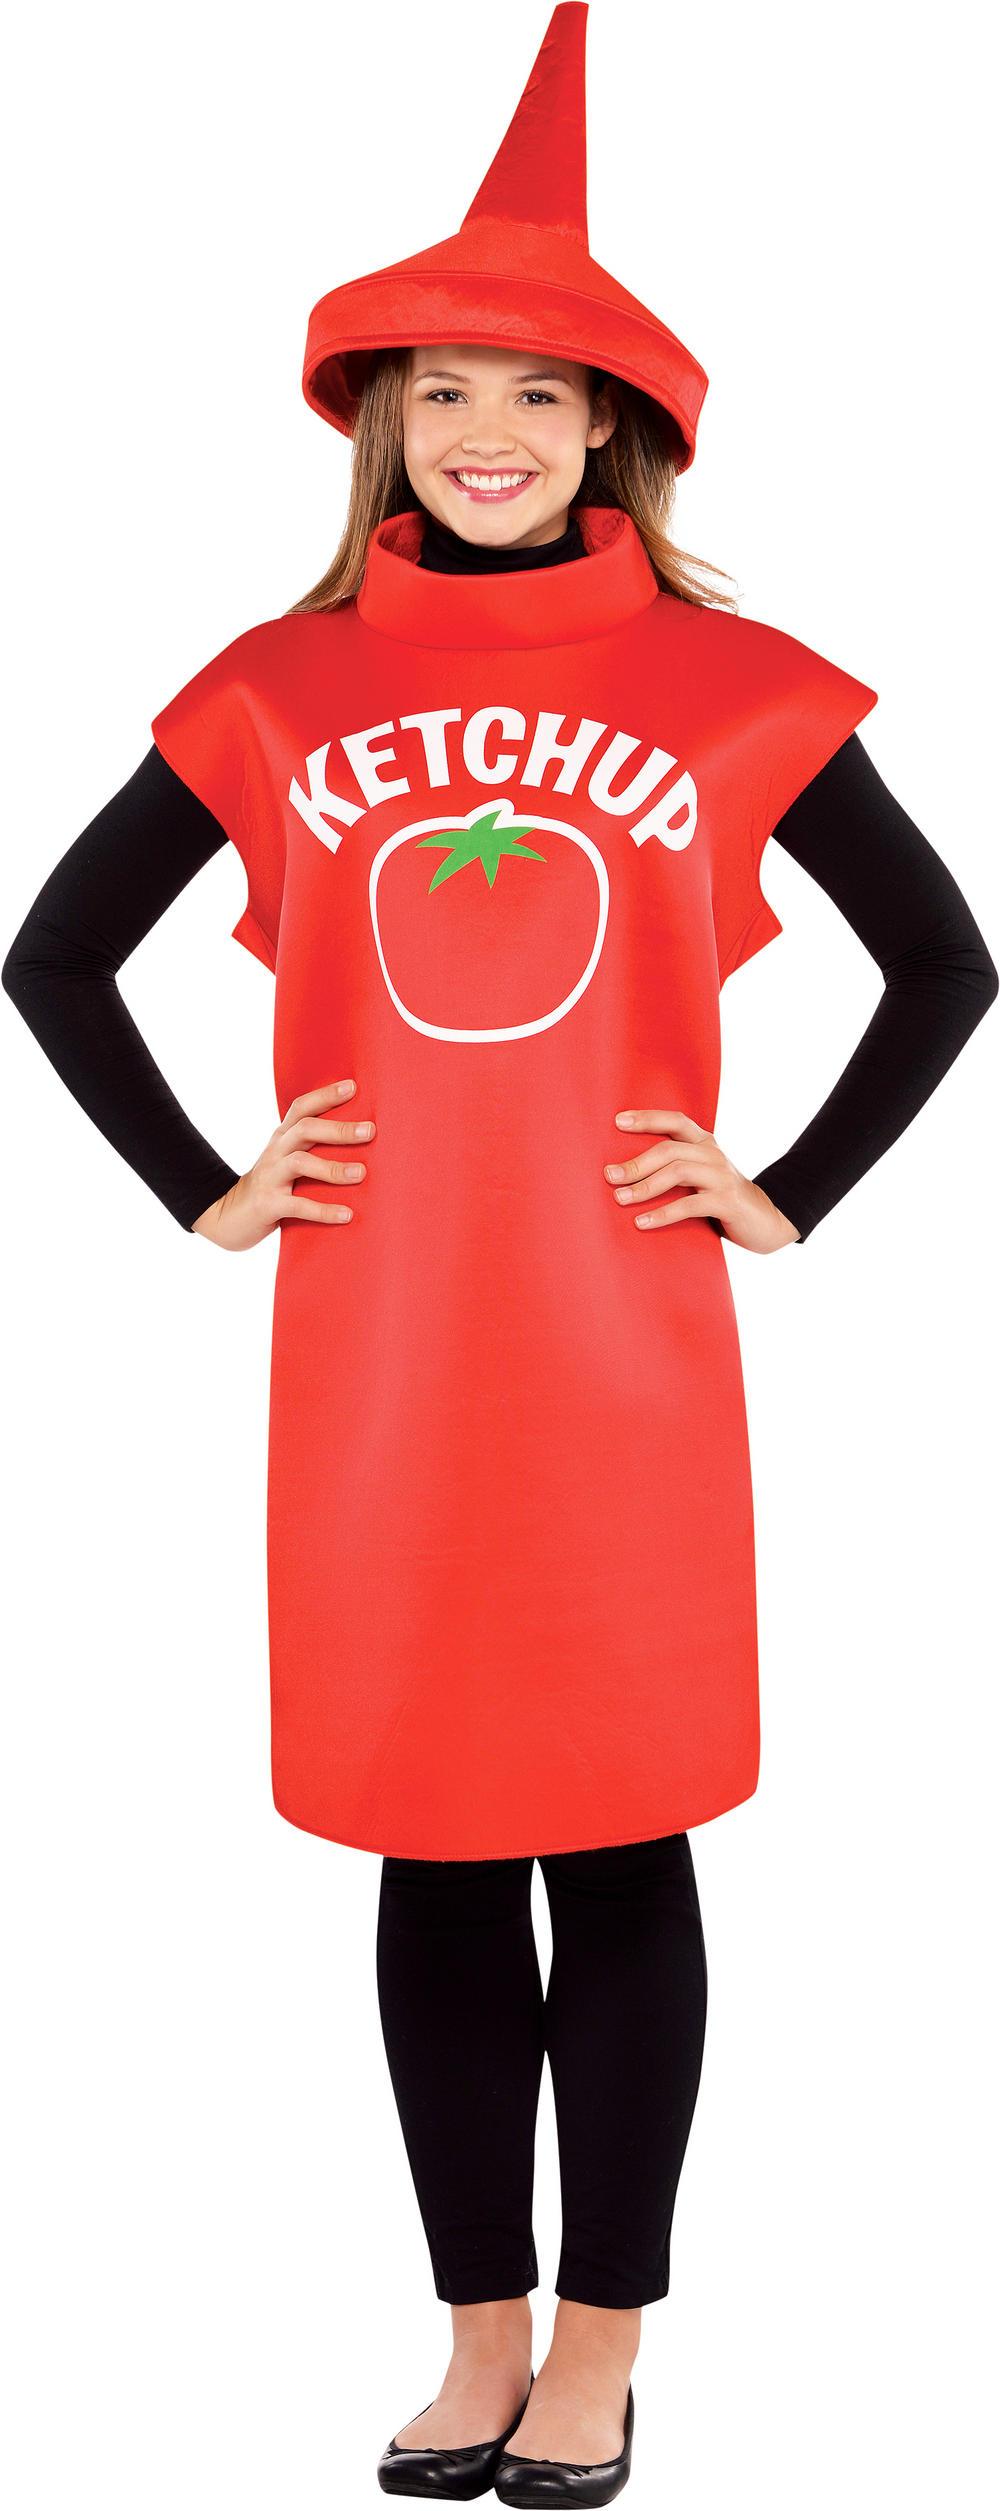 Ketchup Bottle Costume